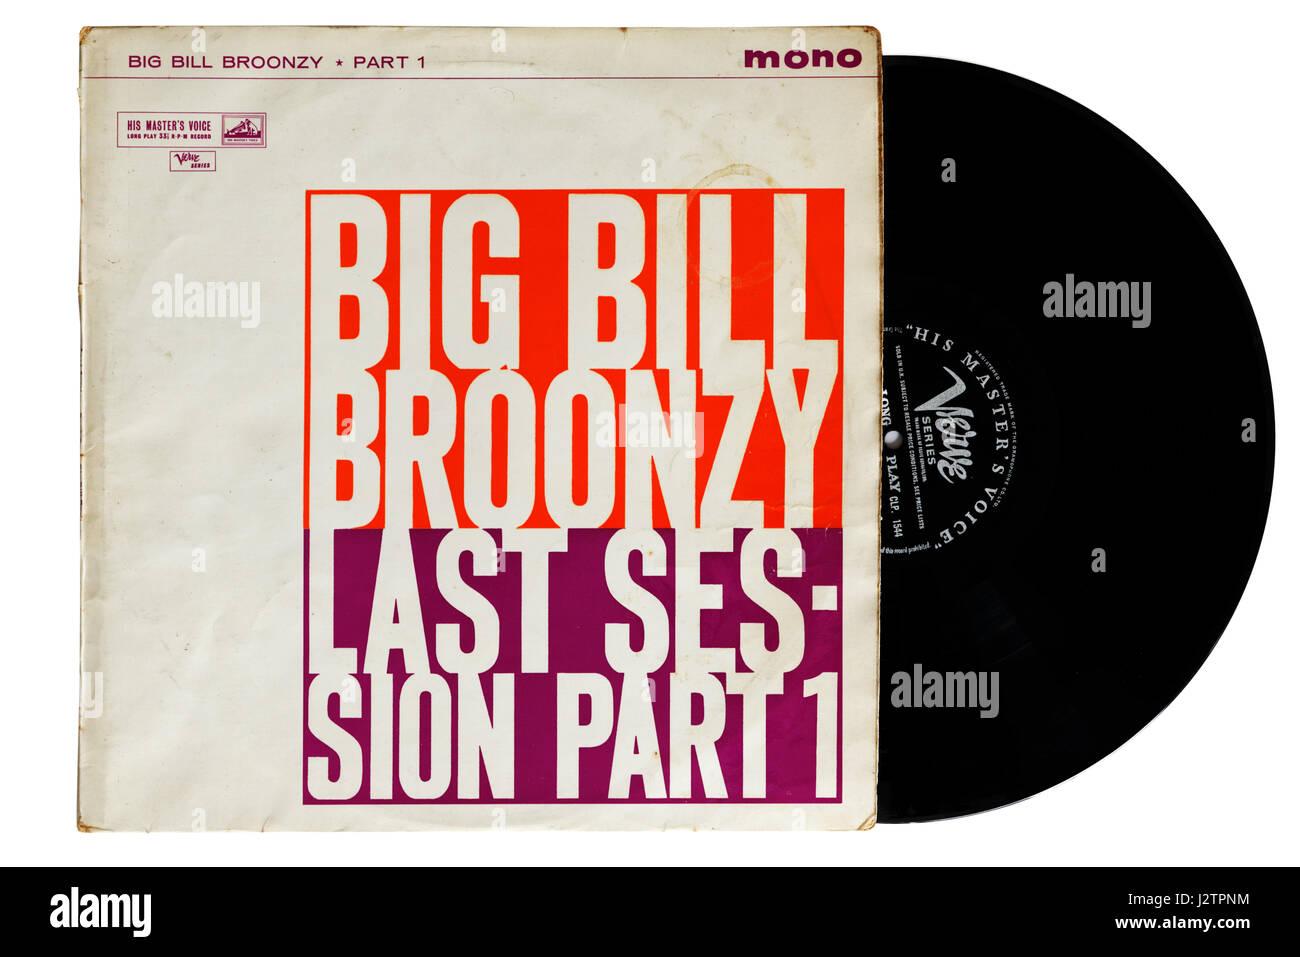 Big Bill Broonzy album Last Sessions Part 1 on vinyl - Stock Image